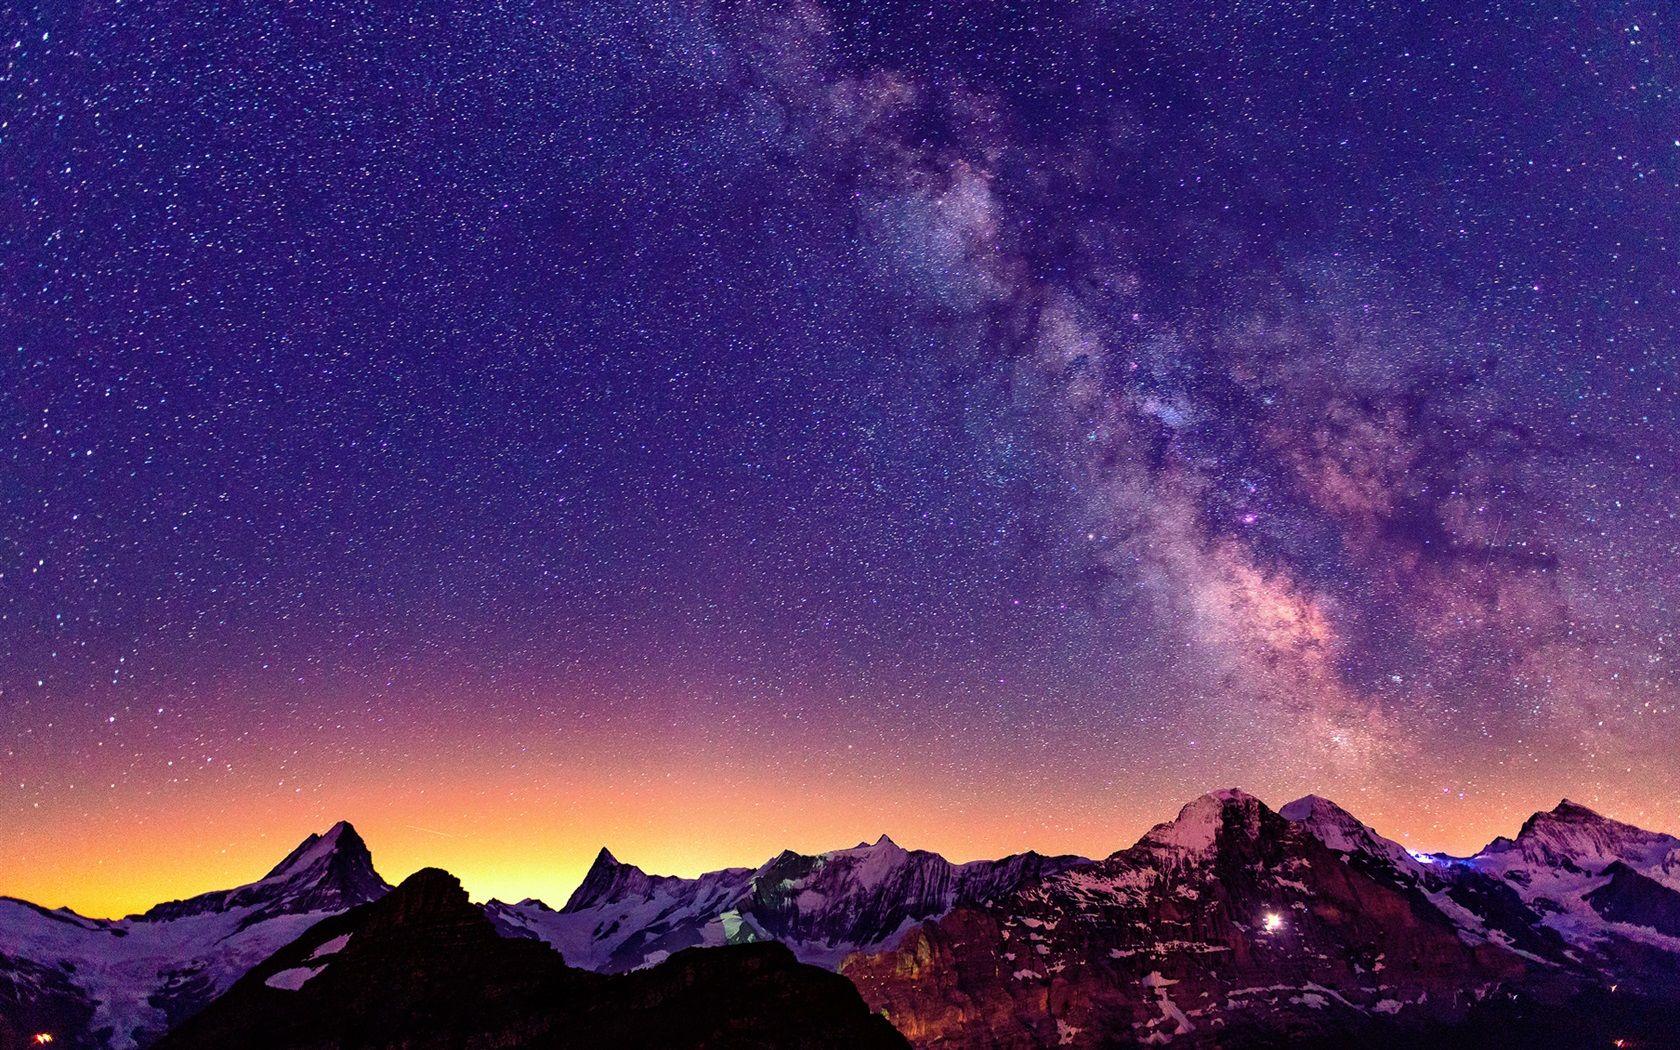 Switzerland The Alps Beautiful Night Sky Stars Wallpaper 1680x1050 Resolution Wallpaper Download Best Night Sky Wallpaper Sunset Mountain Sky Wallpaper